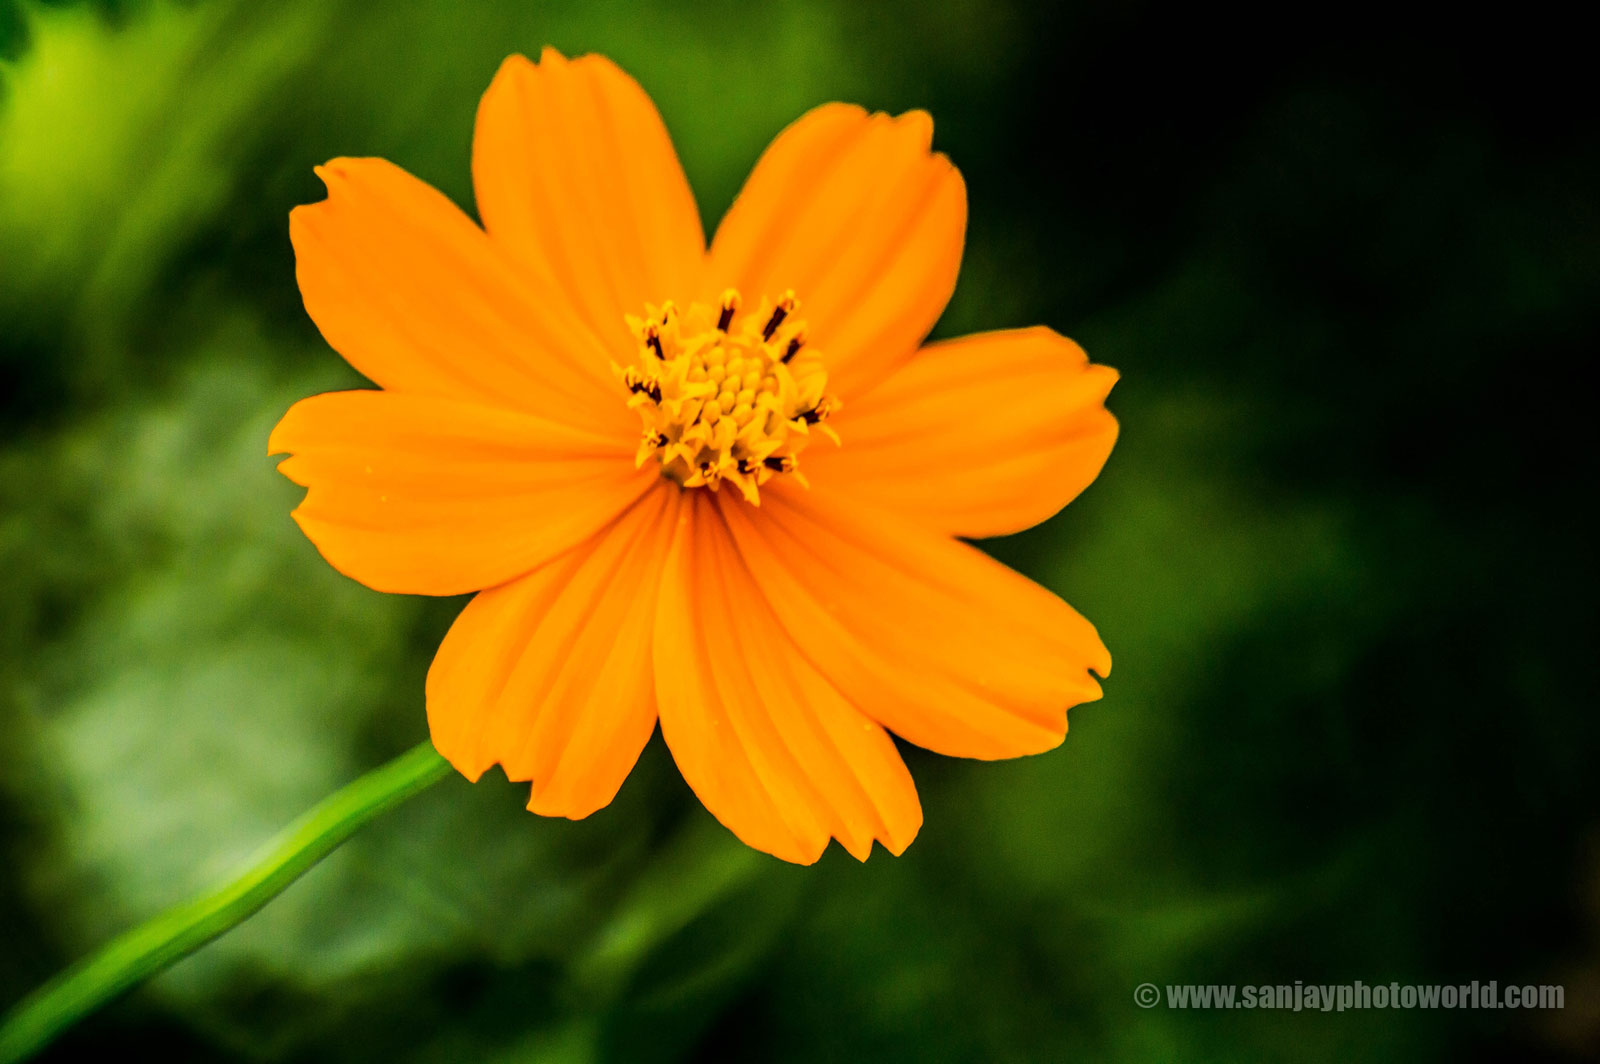 HD Beautiful Flowers Wallpapers - StudioPk